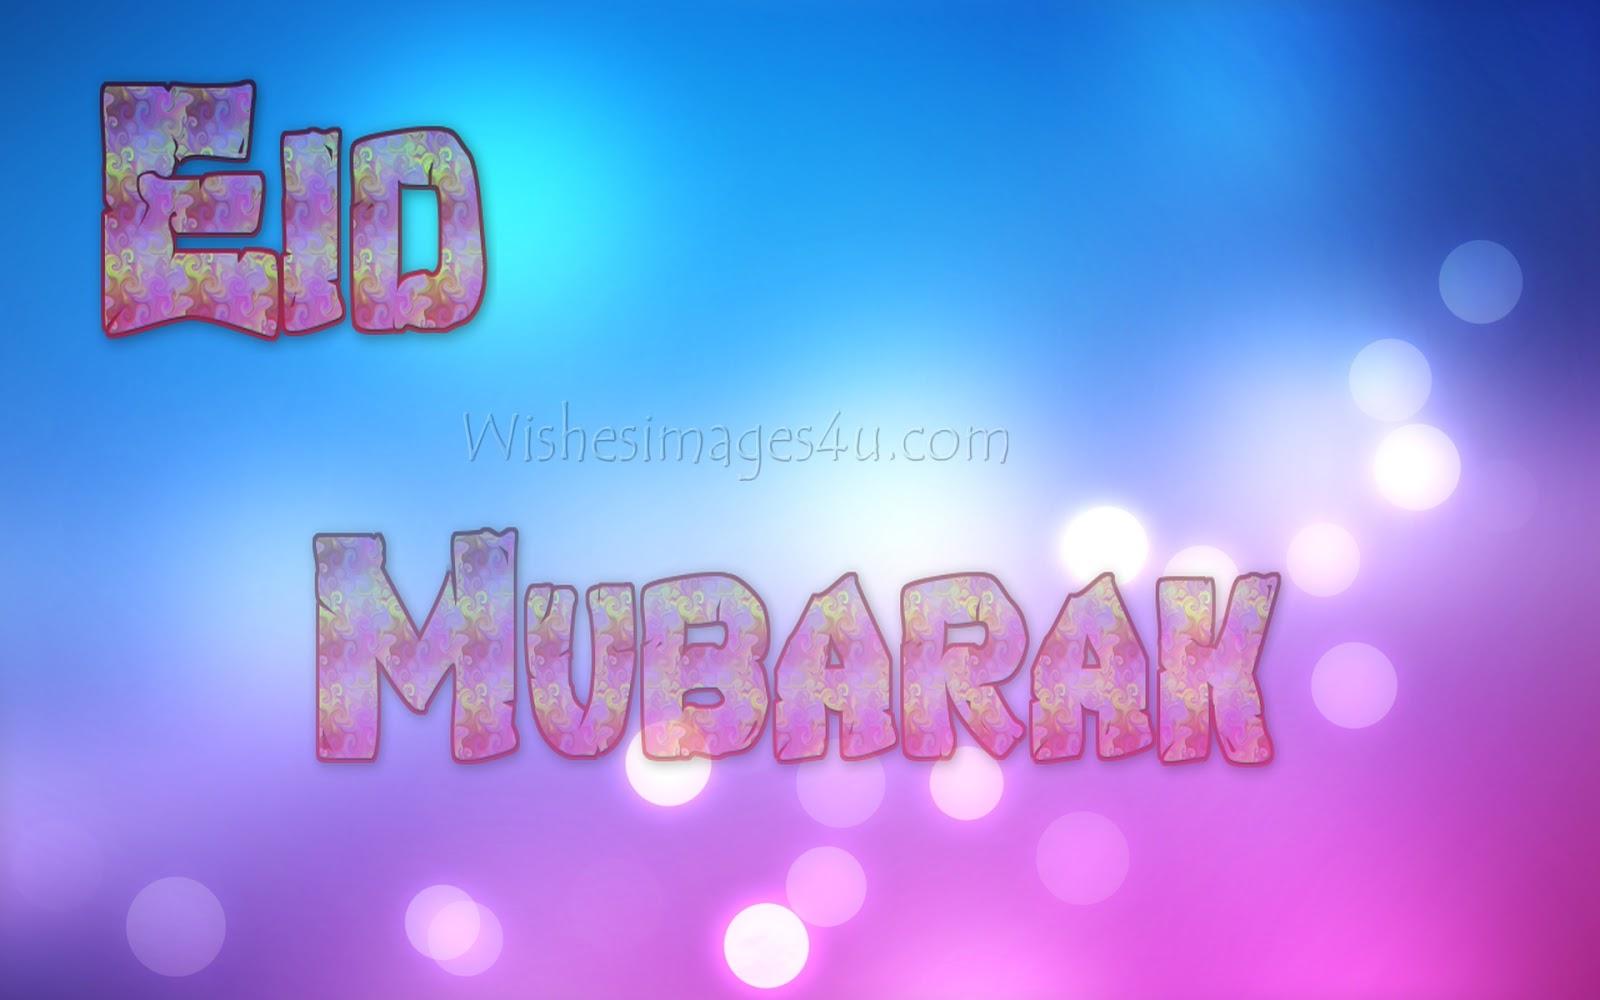 Happy eid mubarak images 2017 latest 2017 eid mubarak images eid mubarak greetings 2017 kristyandbryce Choice Image